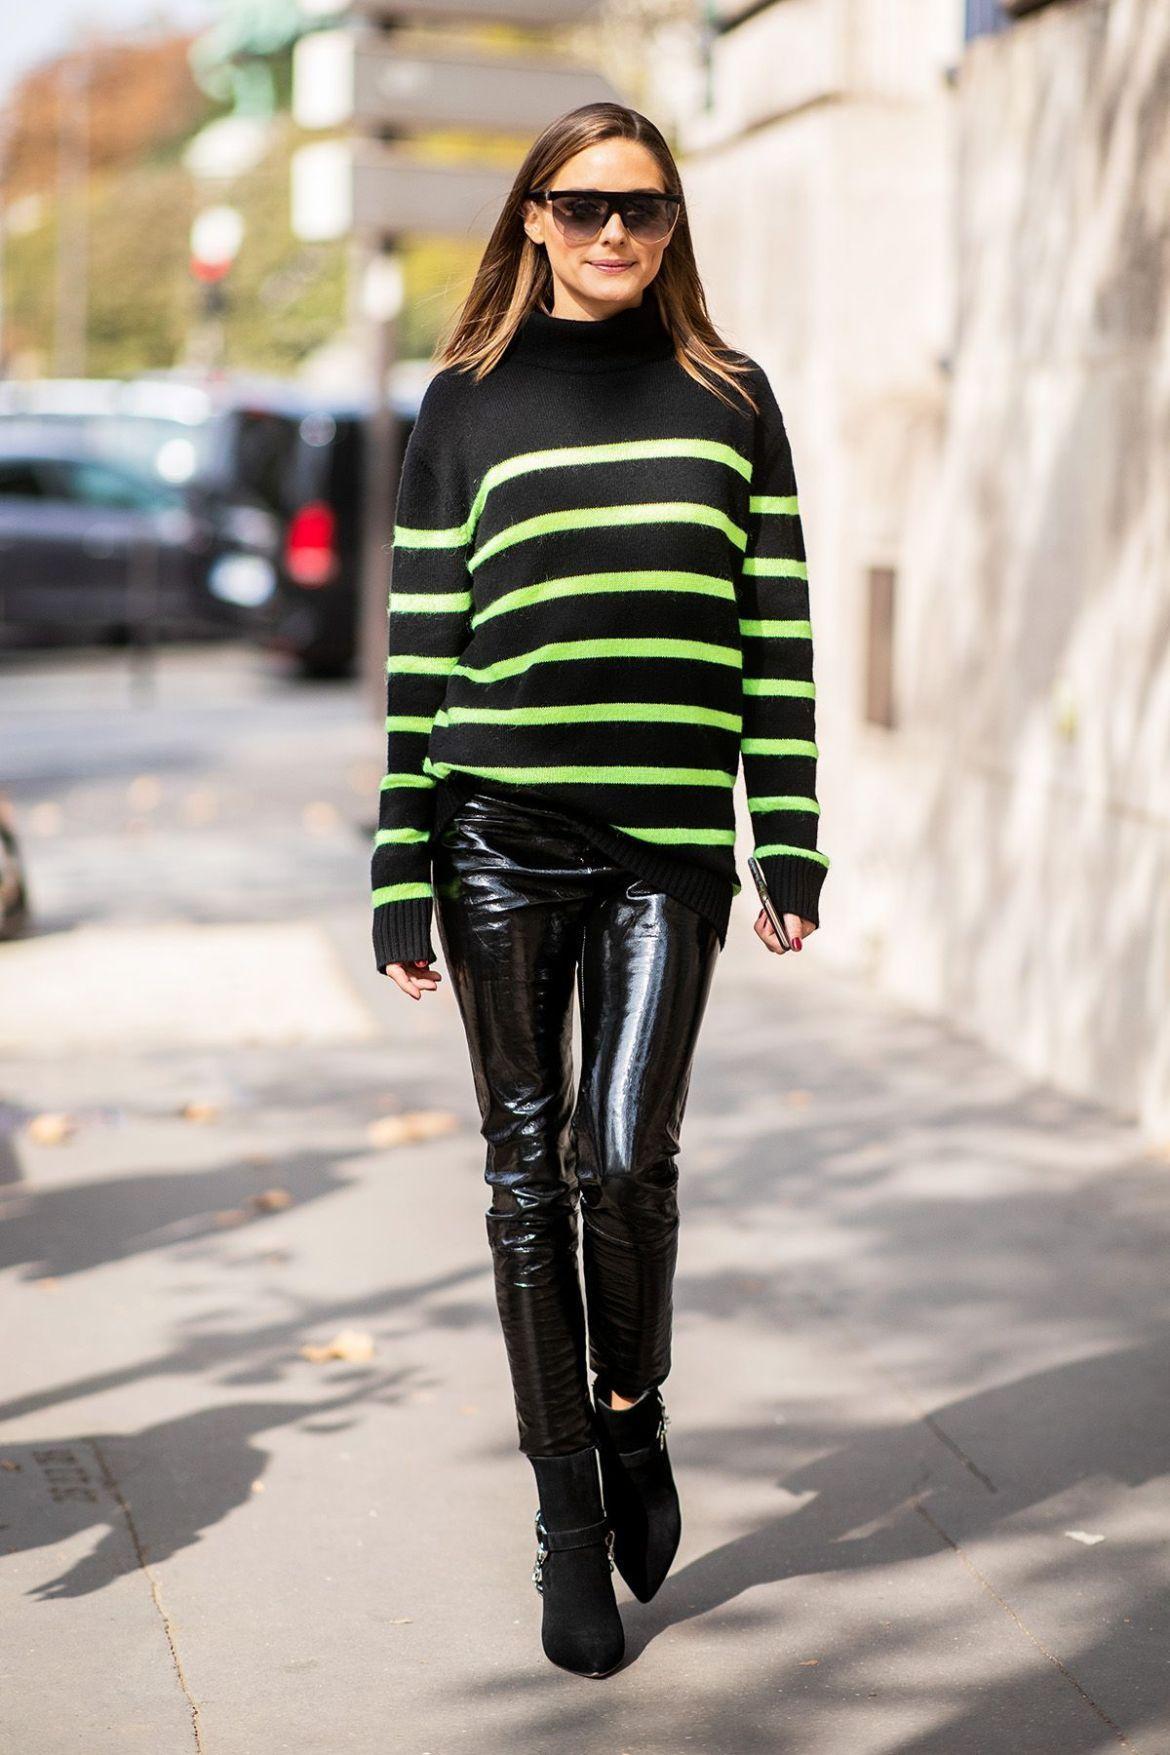 64681d134629 So, Olivia Palermo Has a New Look - Bintroo | Olivia Palermo Style i ...